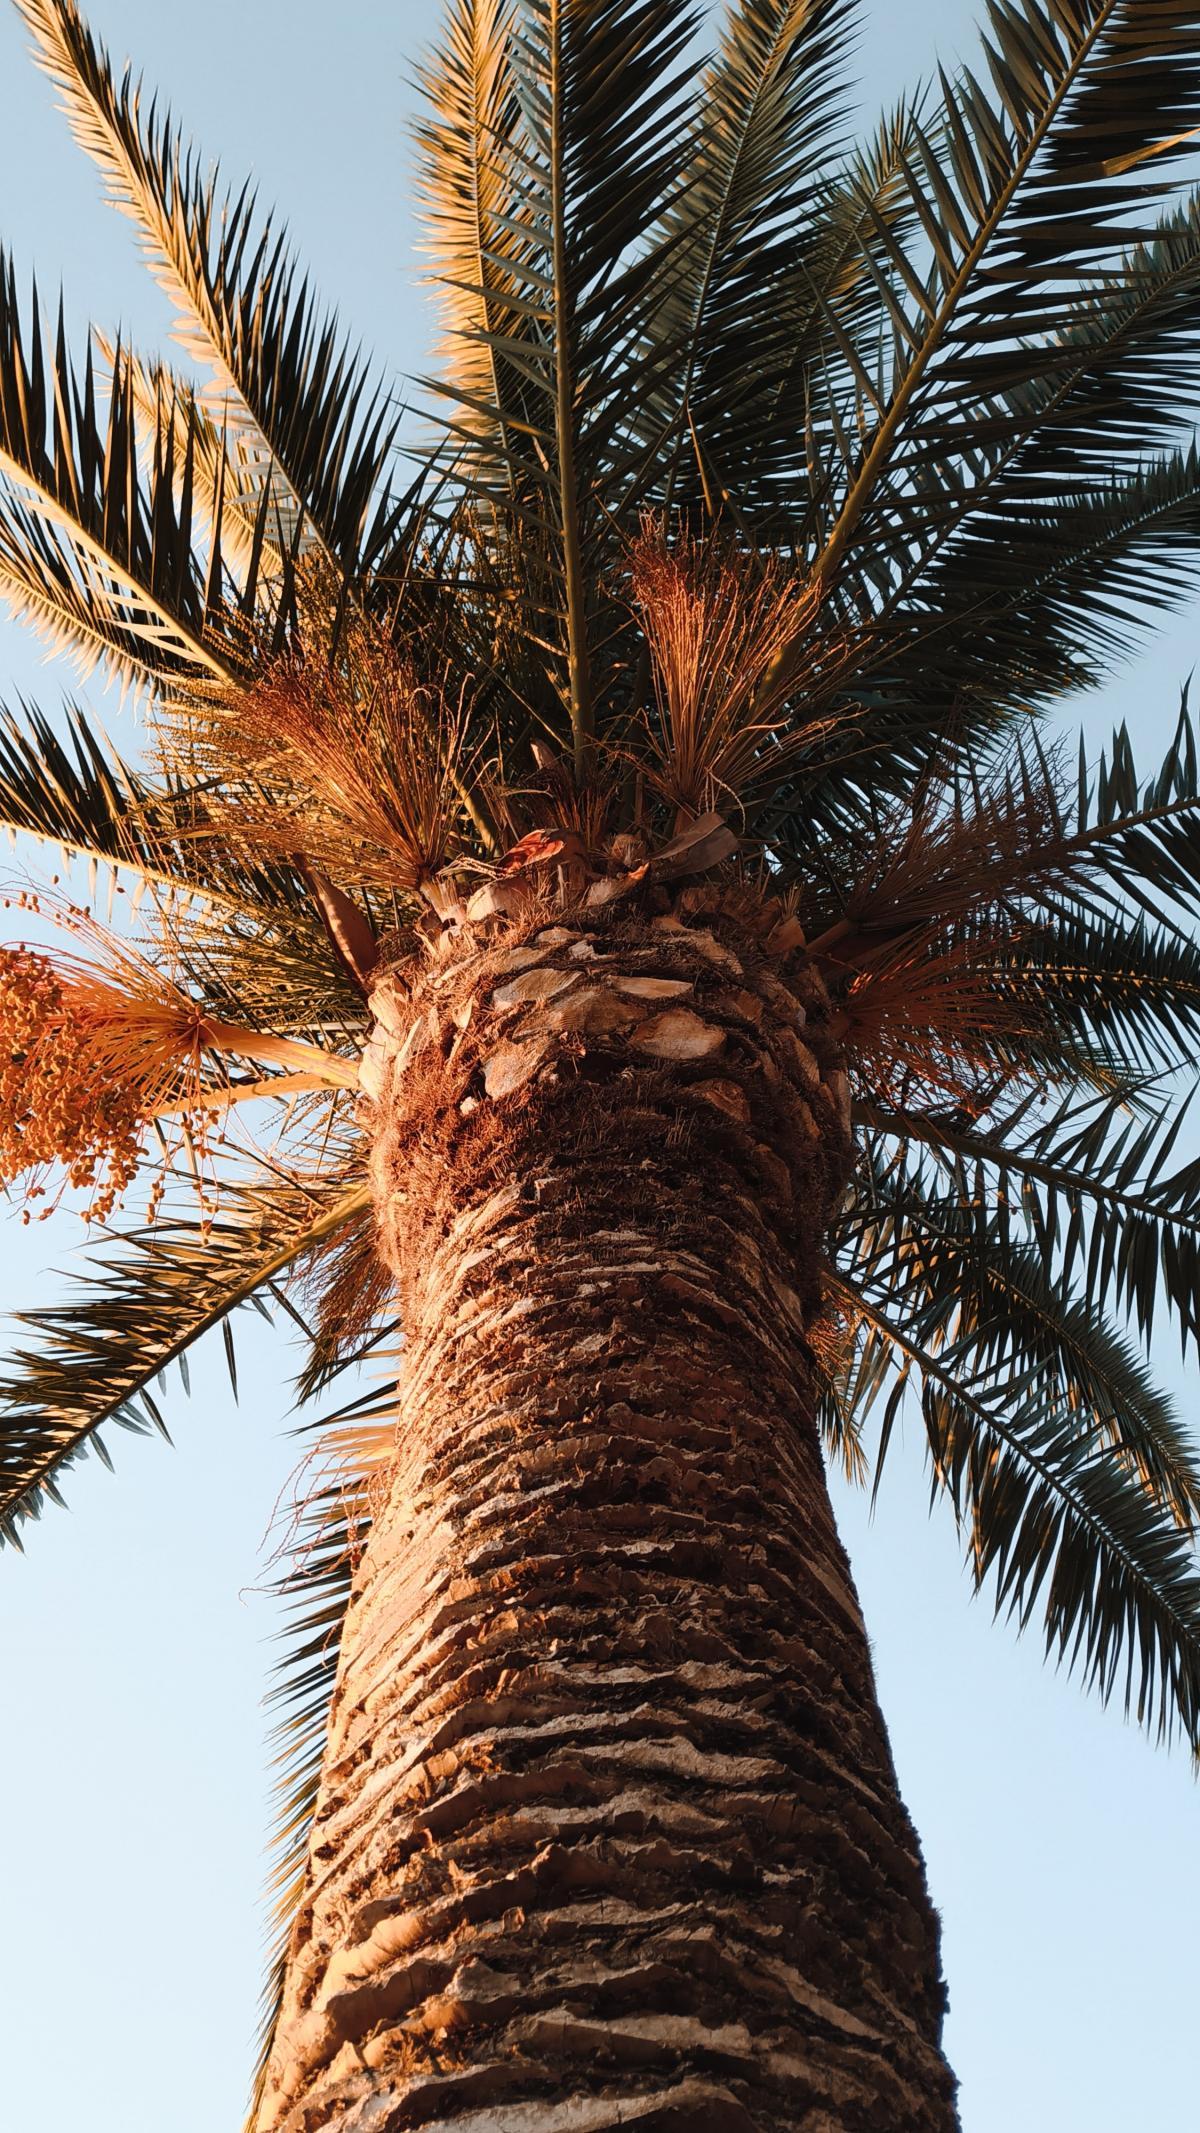 Coconut Date Tree